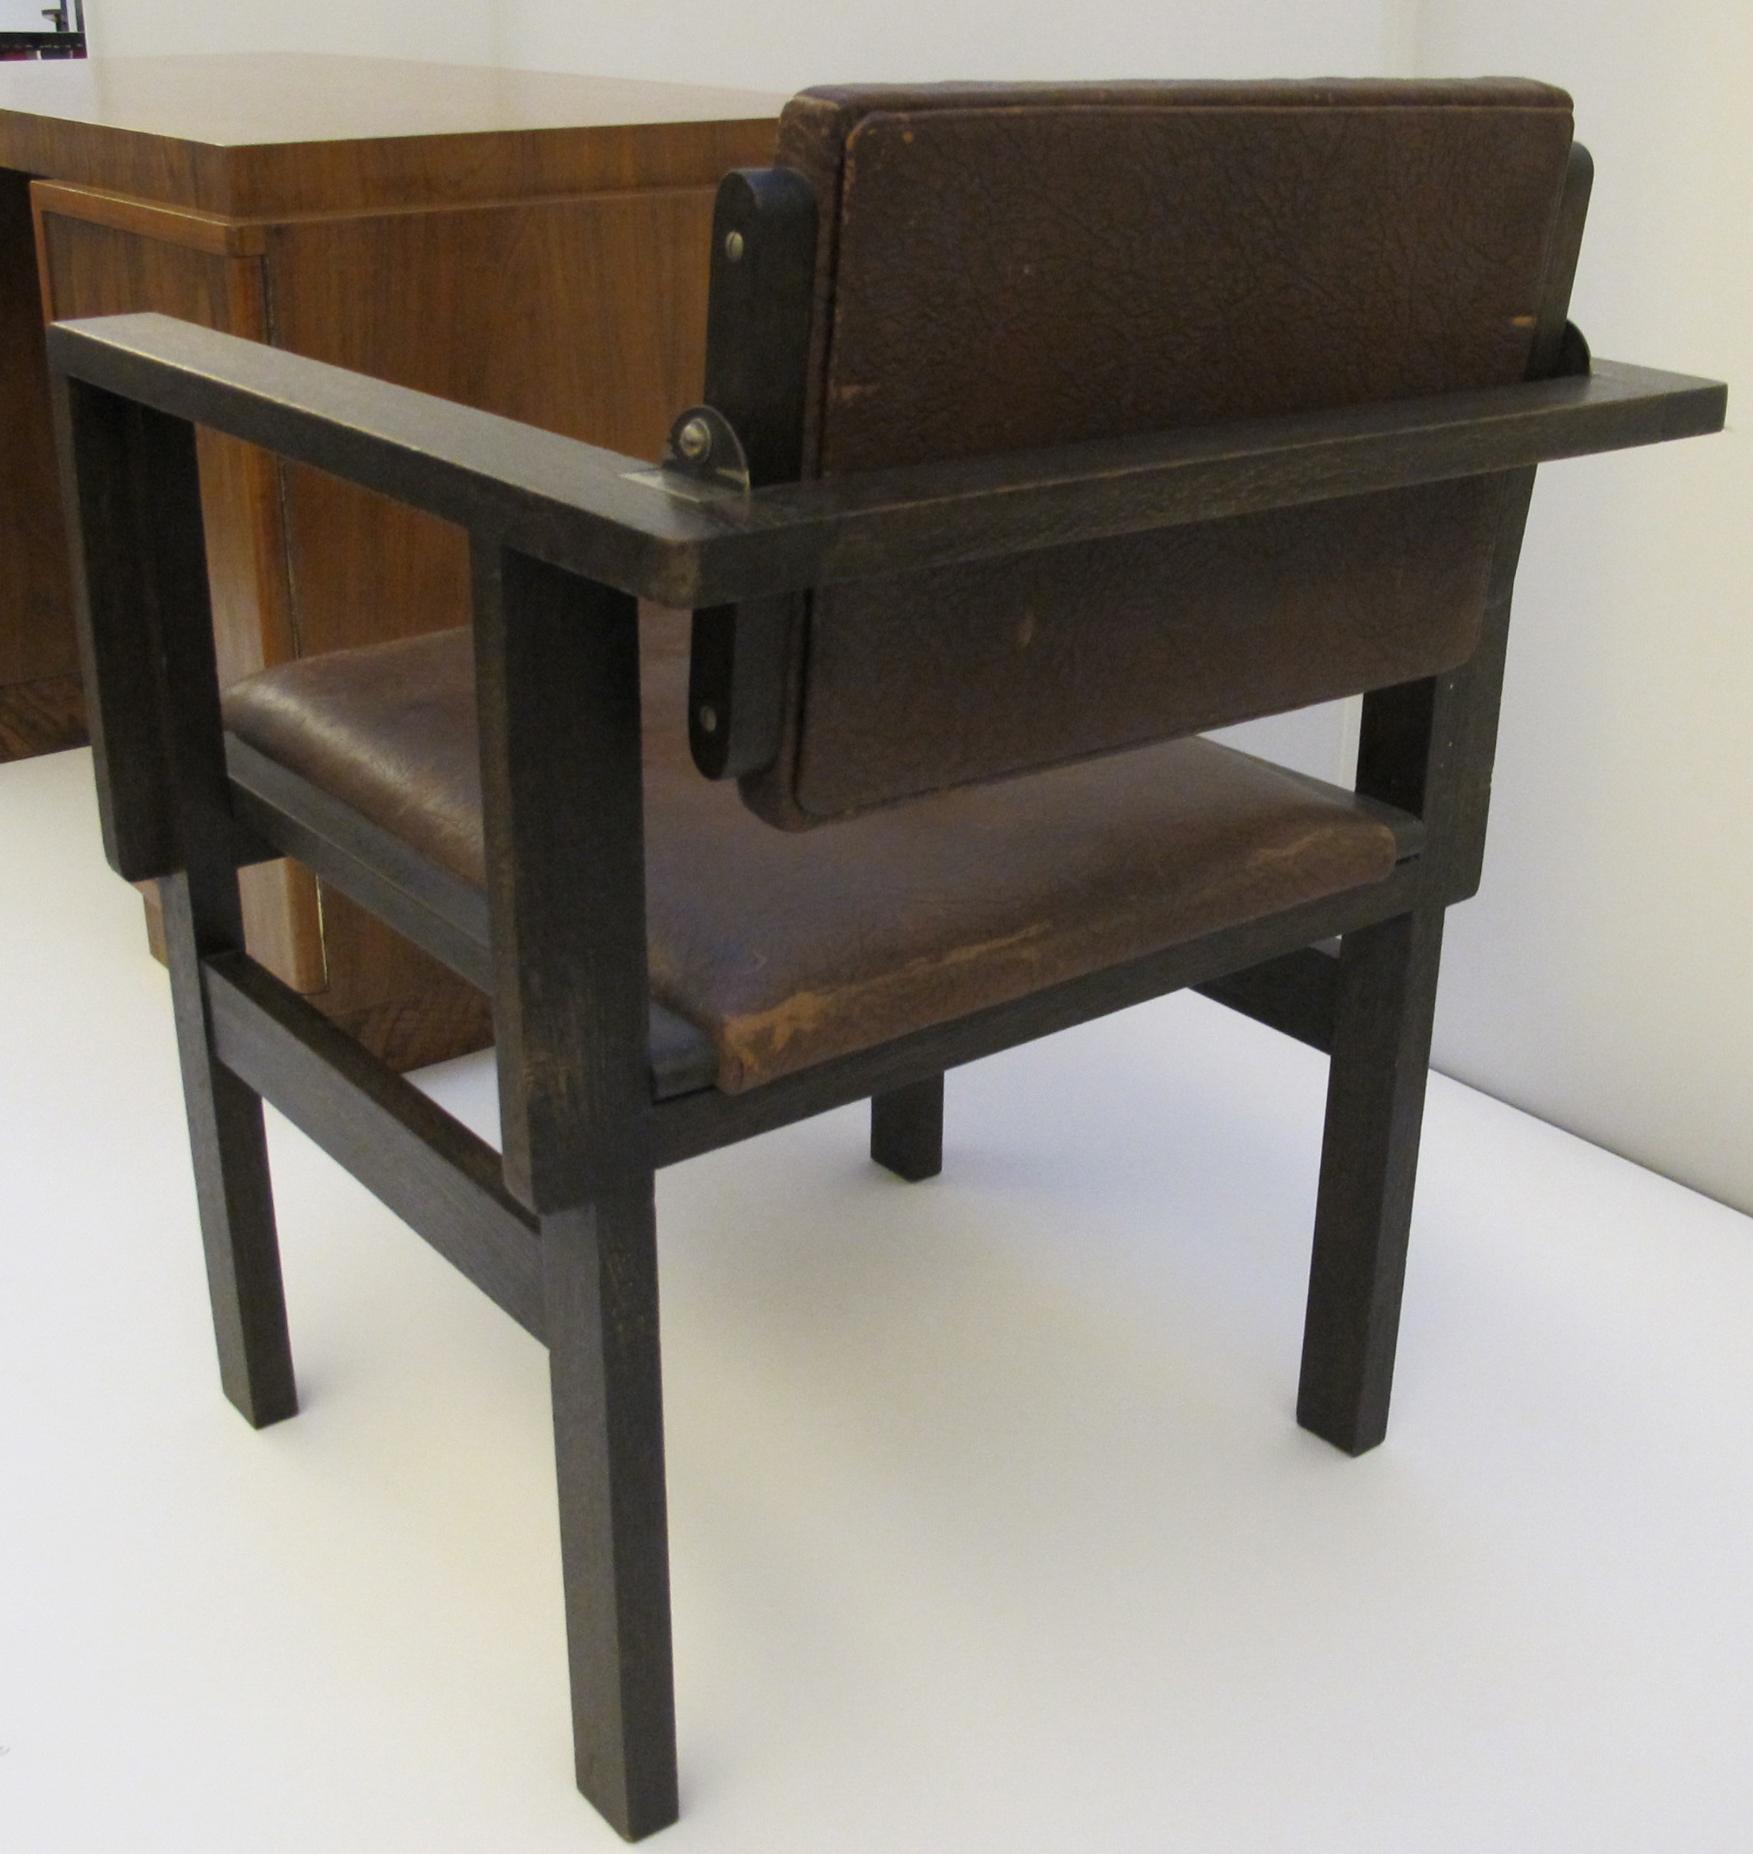 File:Peter keler, sedia con rivestimenti in pelle, 1925 ca 02.JPG ...